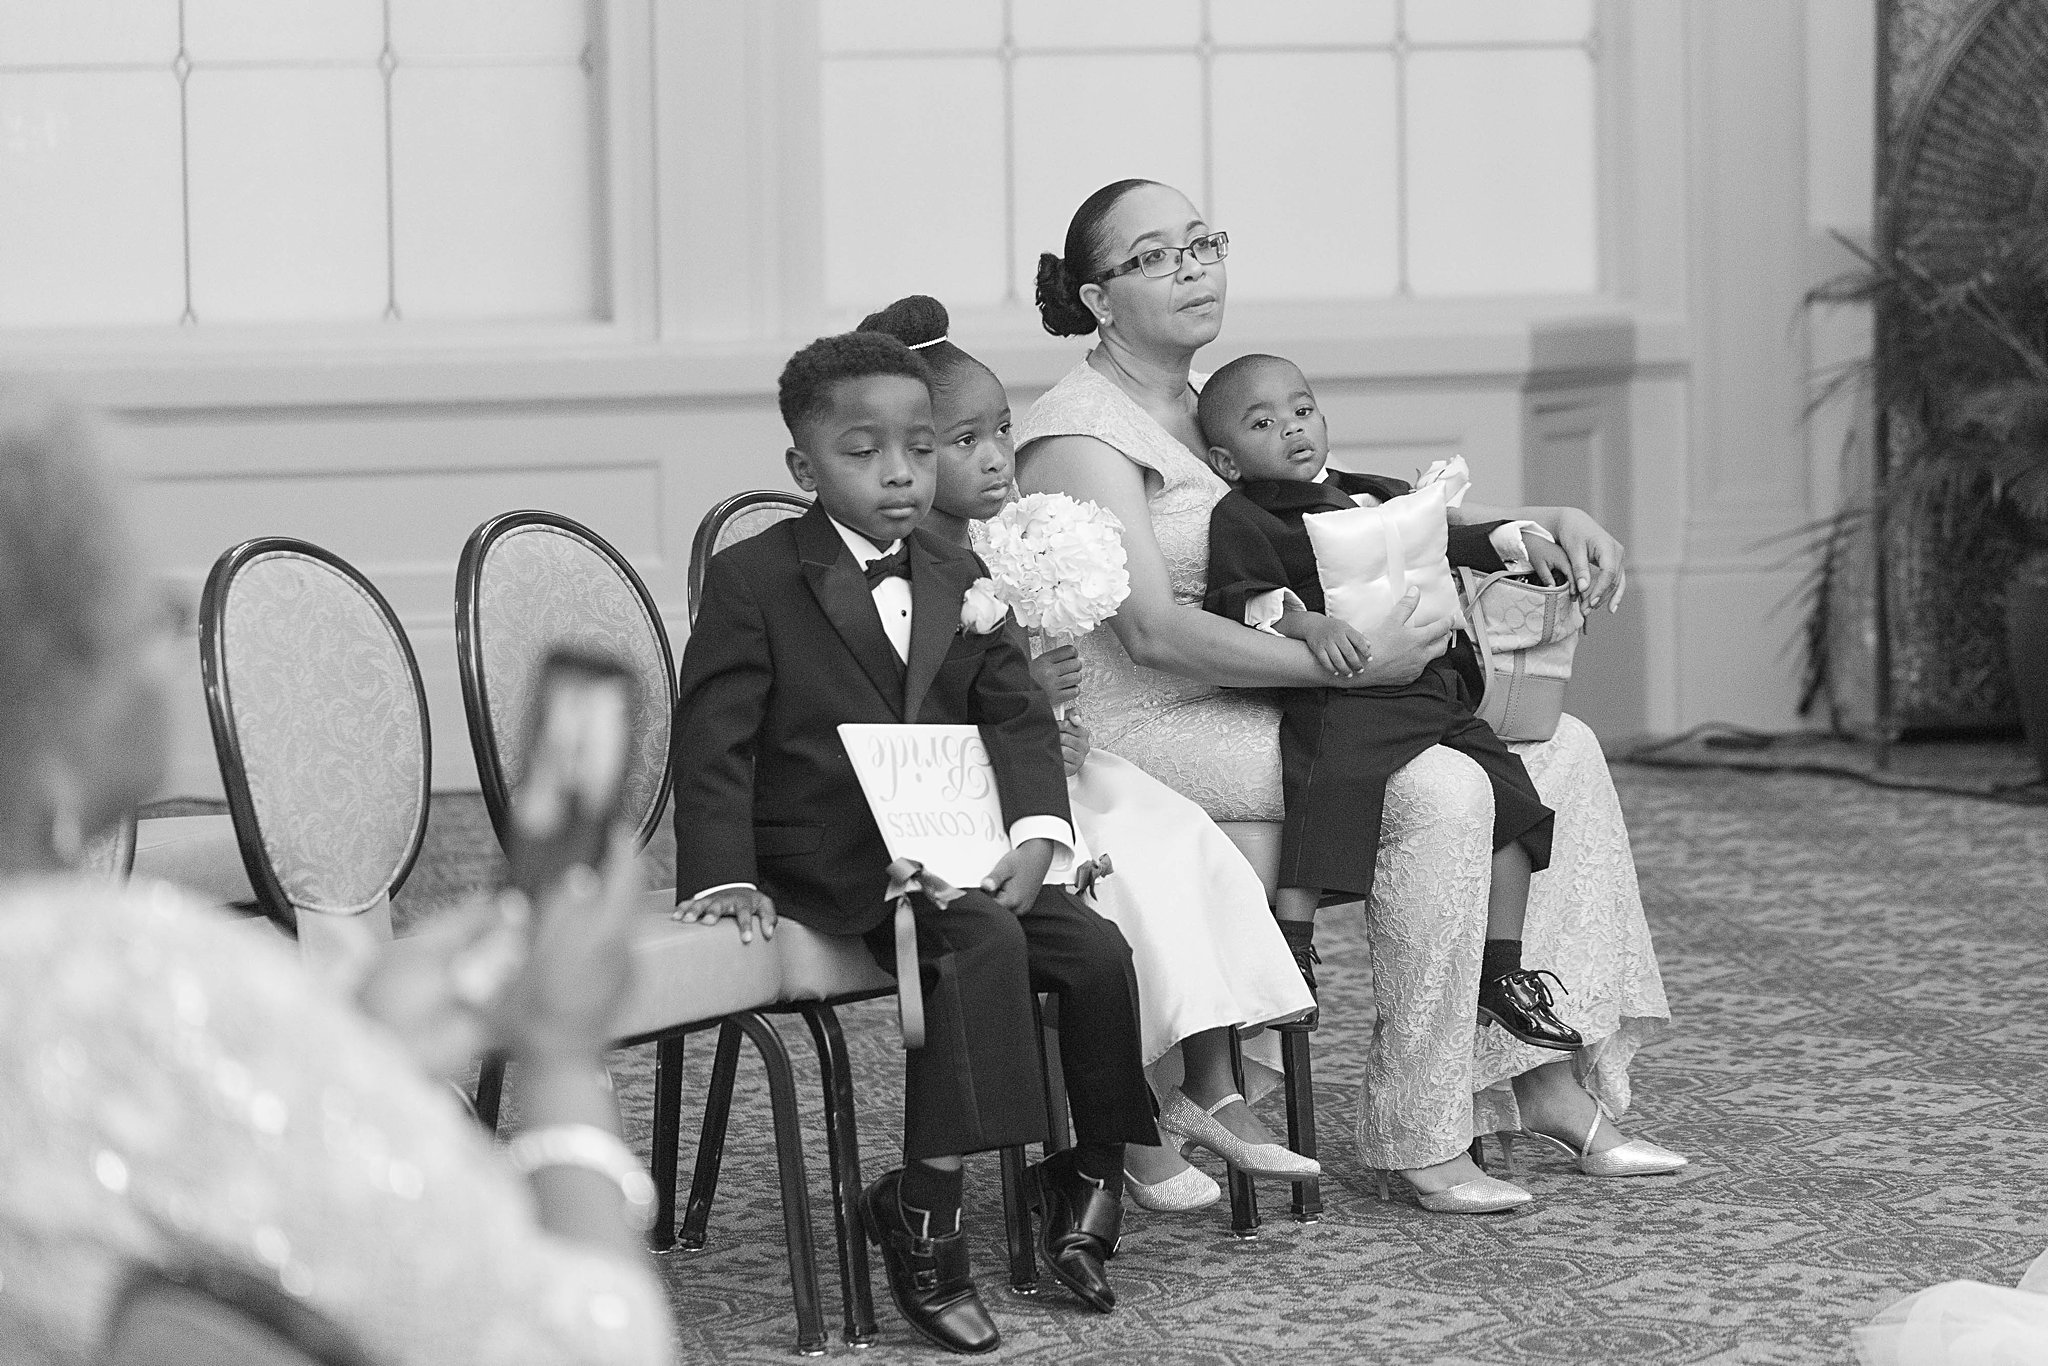 wedding_john_marshall_ballroom_richmond_vawedding_john_marshall_ballroom_richmond_va